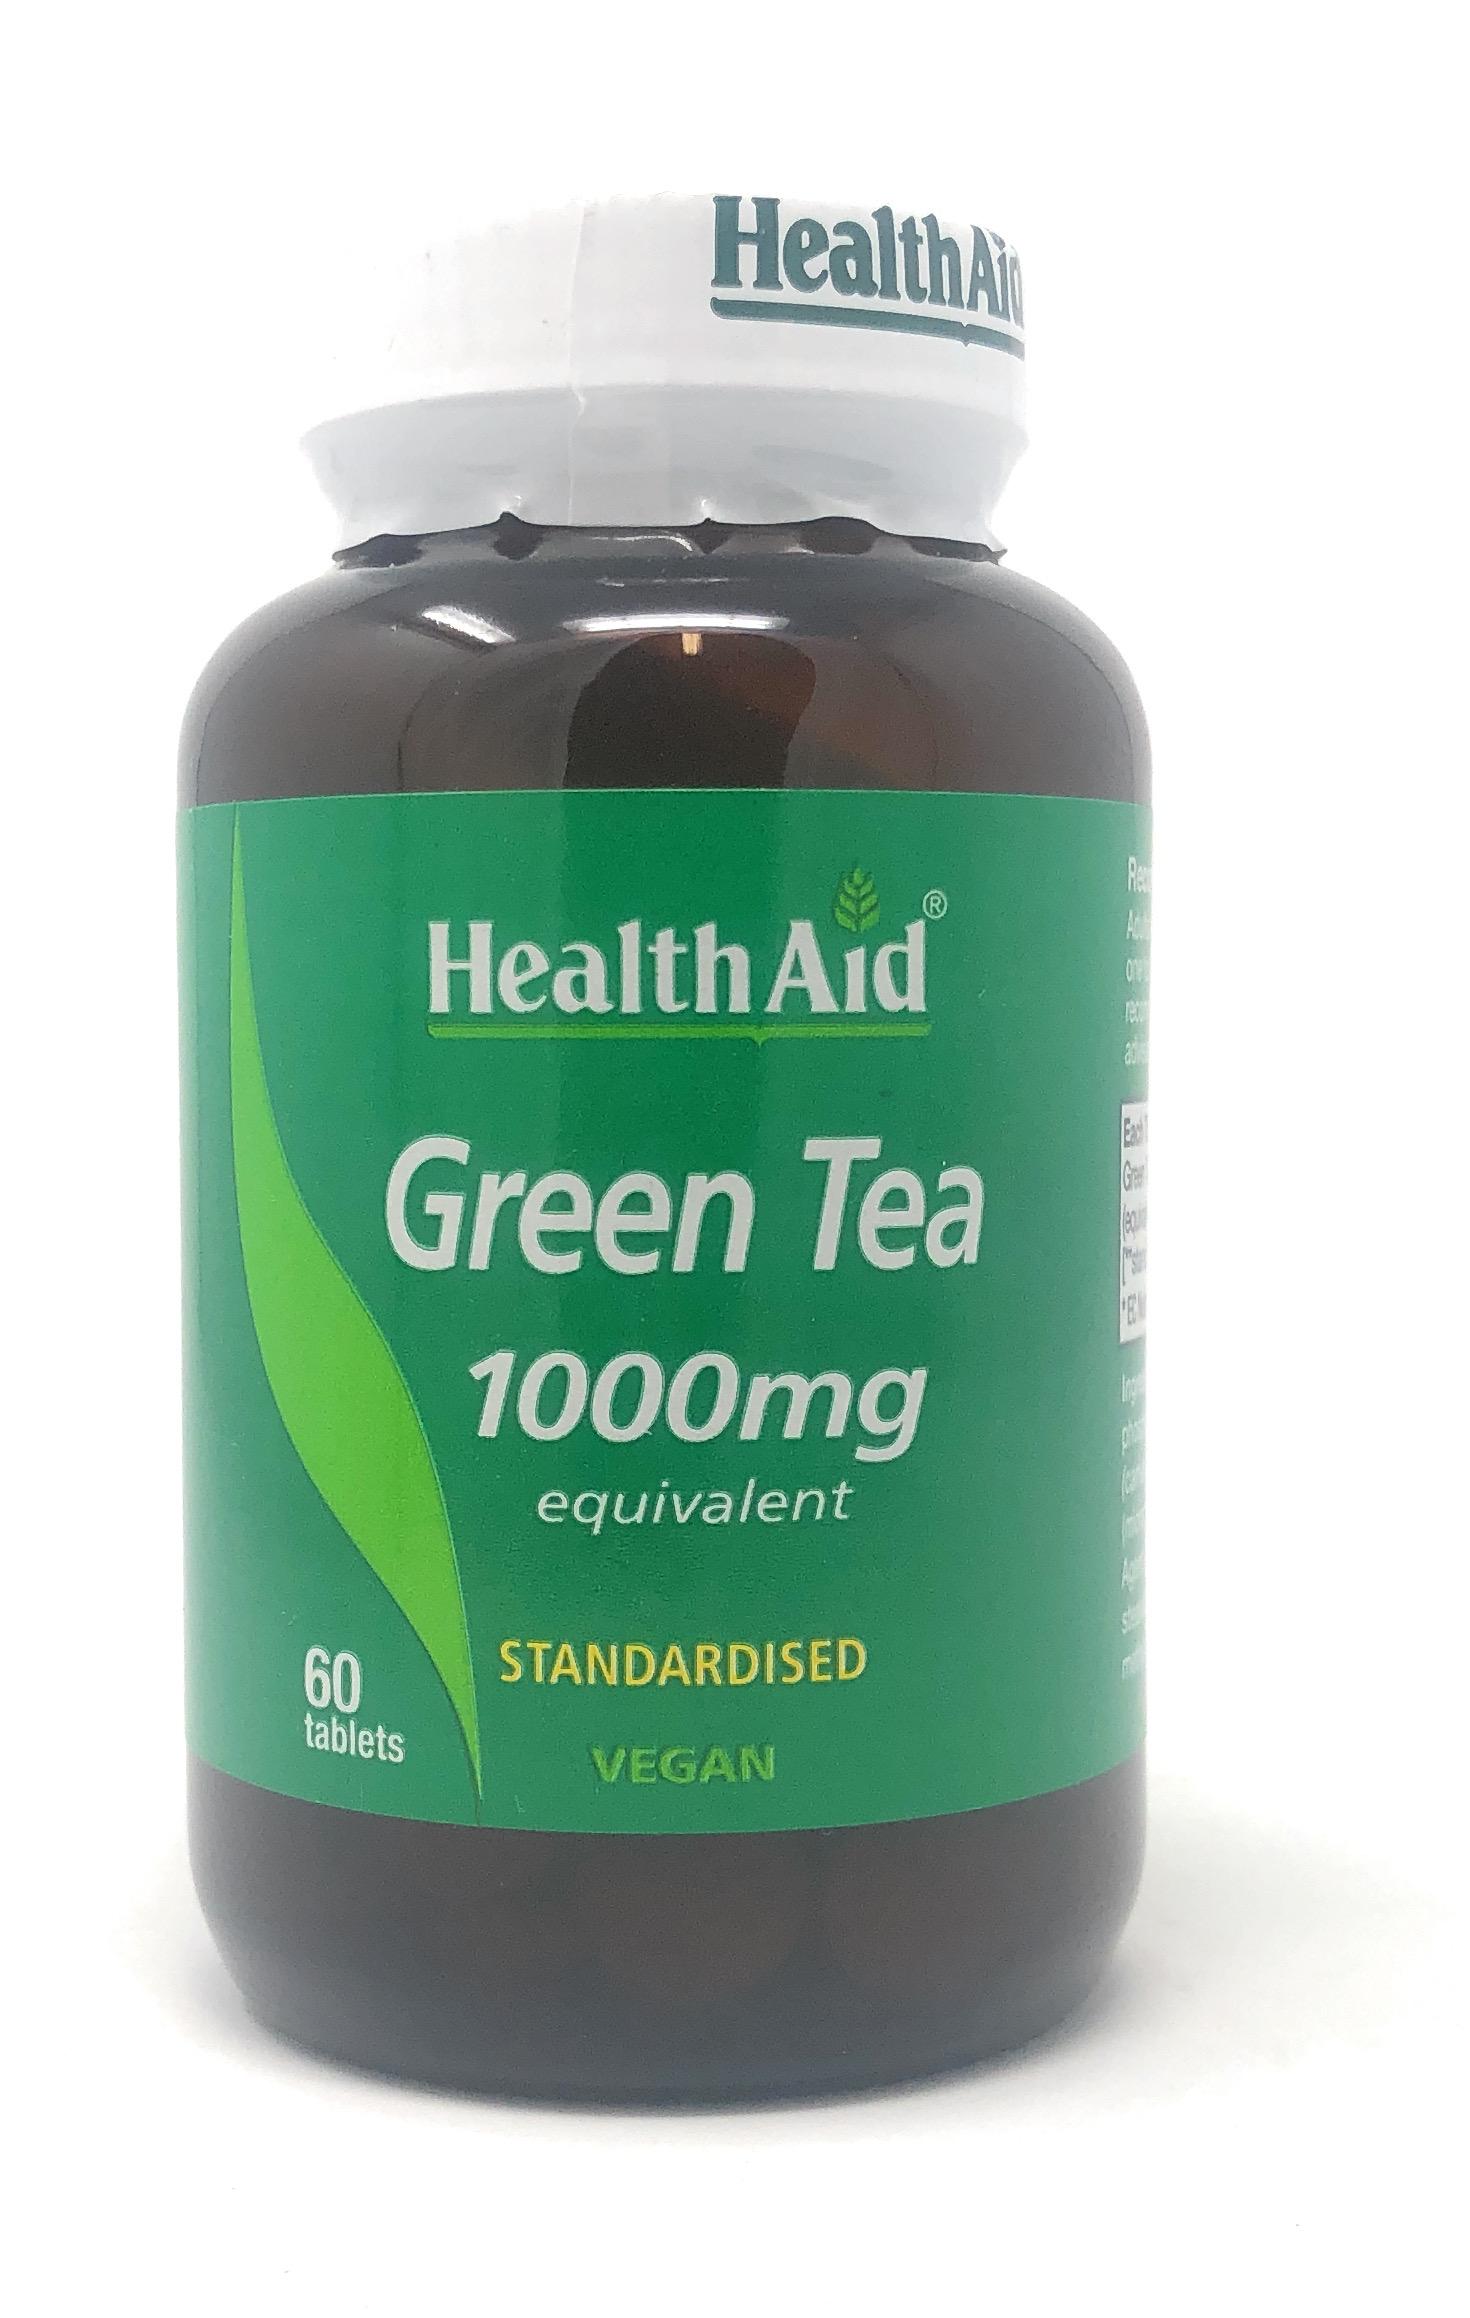 HealthAid Green Tea (Grüner Tee) Extract 1000mg equivalent (standardised) 60 Tabletten (vegan)